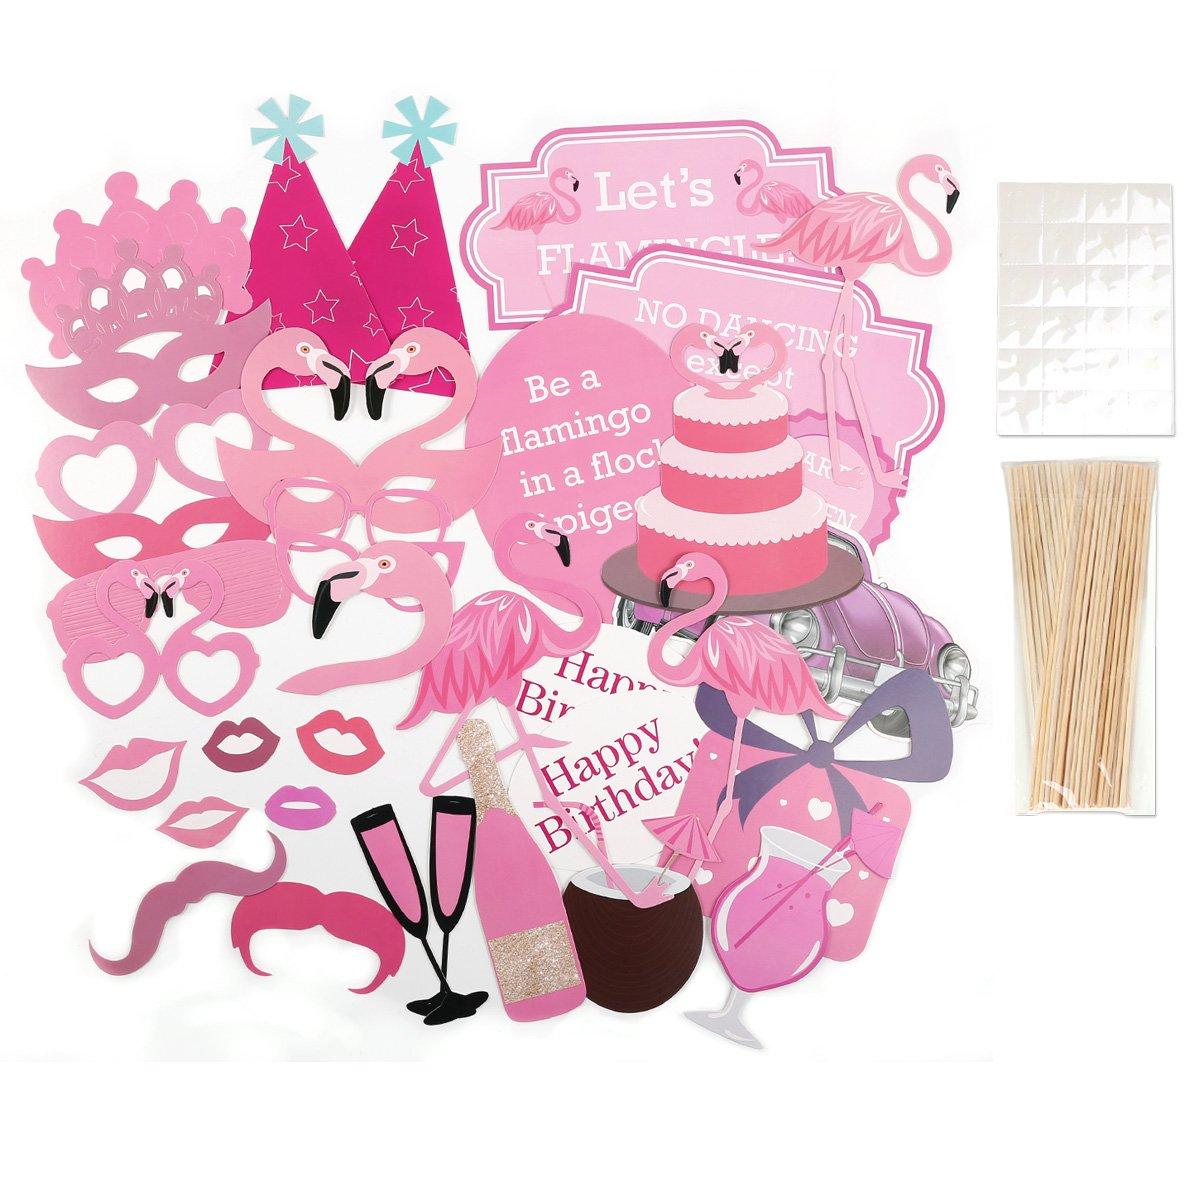 CLE DE TOUS - Pack de 31 piezas Photocall para Bautizo Fiesta Baby Showers Cumpleaño Set Decorativo Cartulinas para fotografías (Rosa para niña)